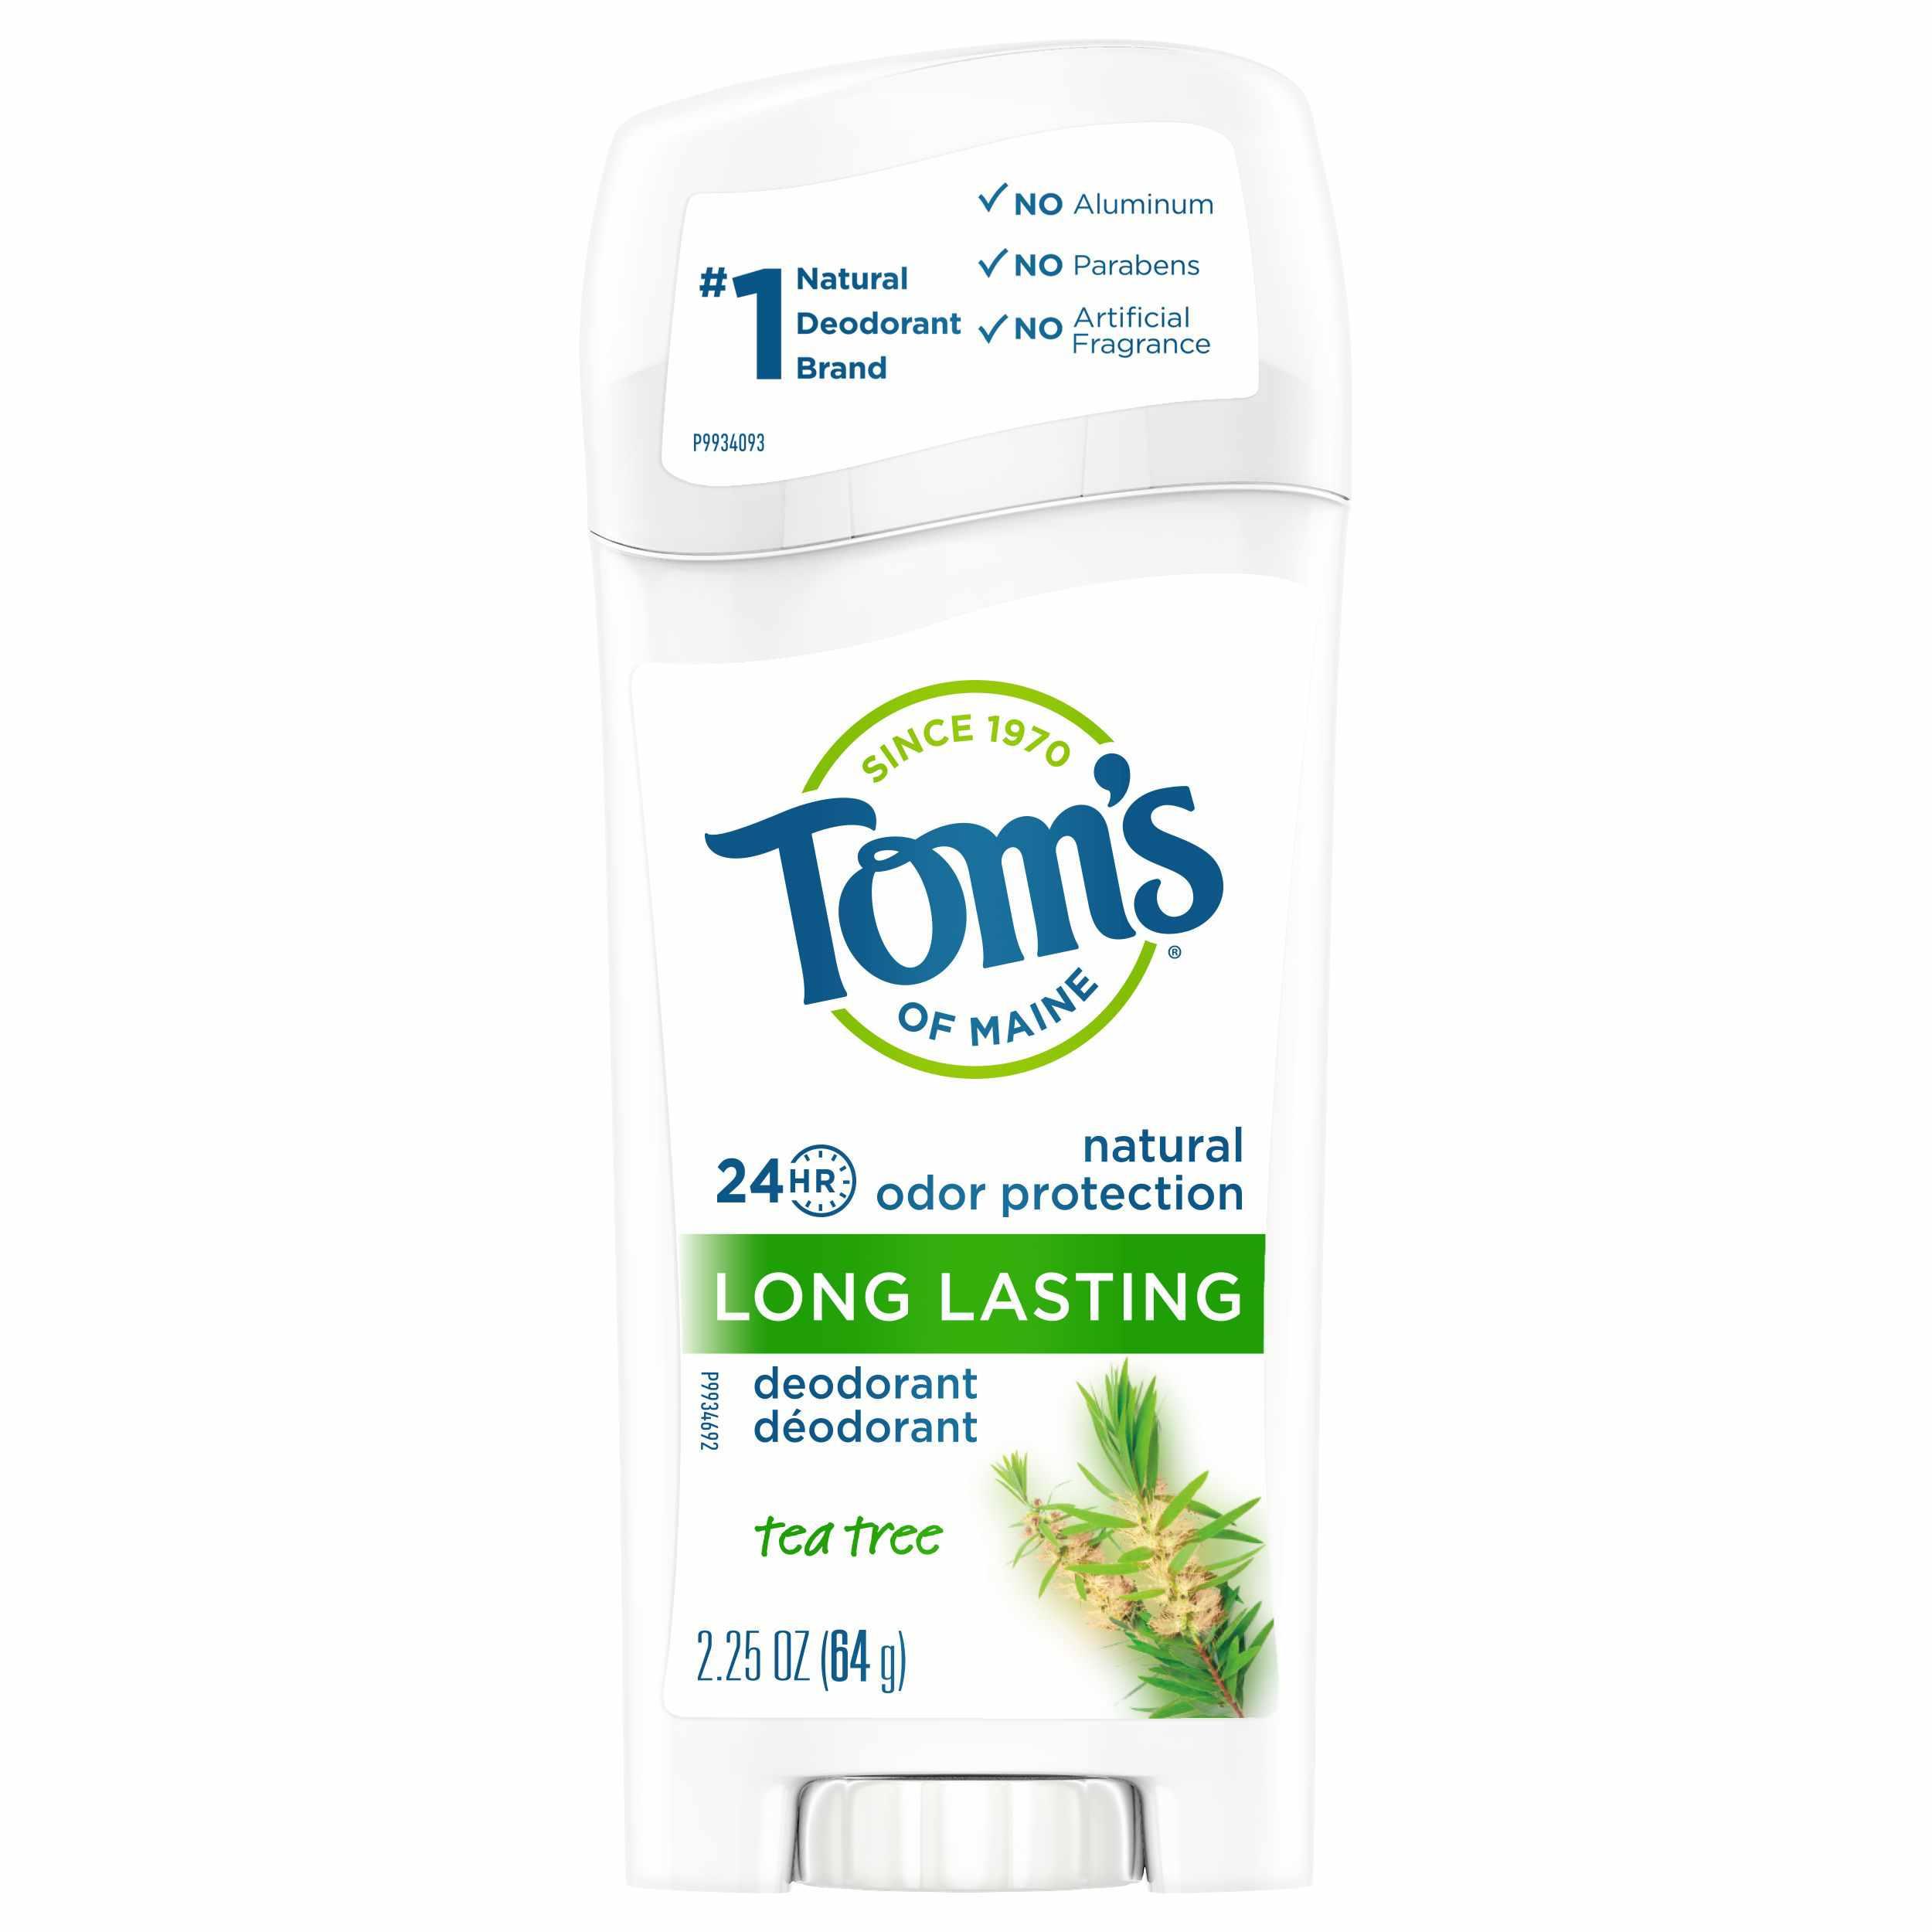 Tom's of Maine Natural Deodorant Tea Tree